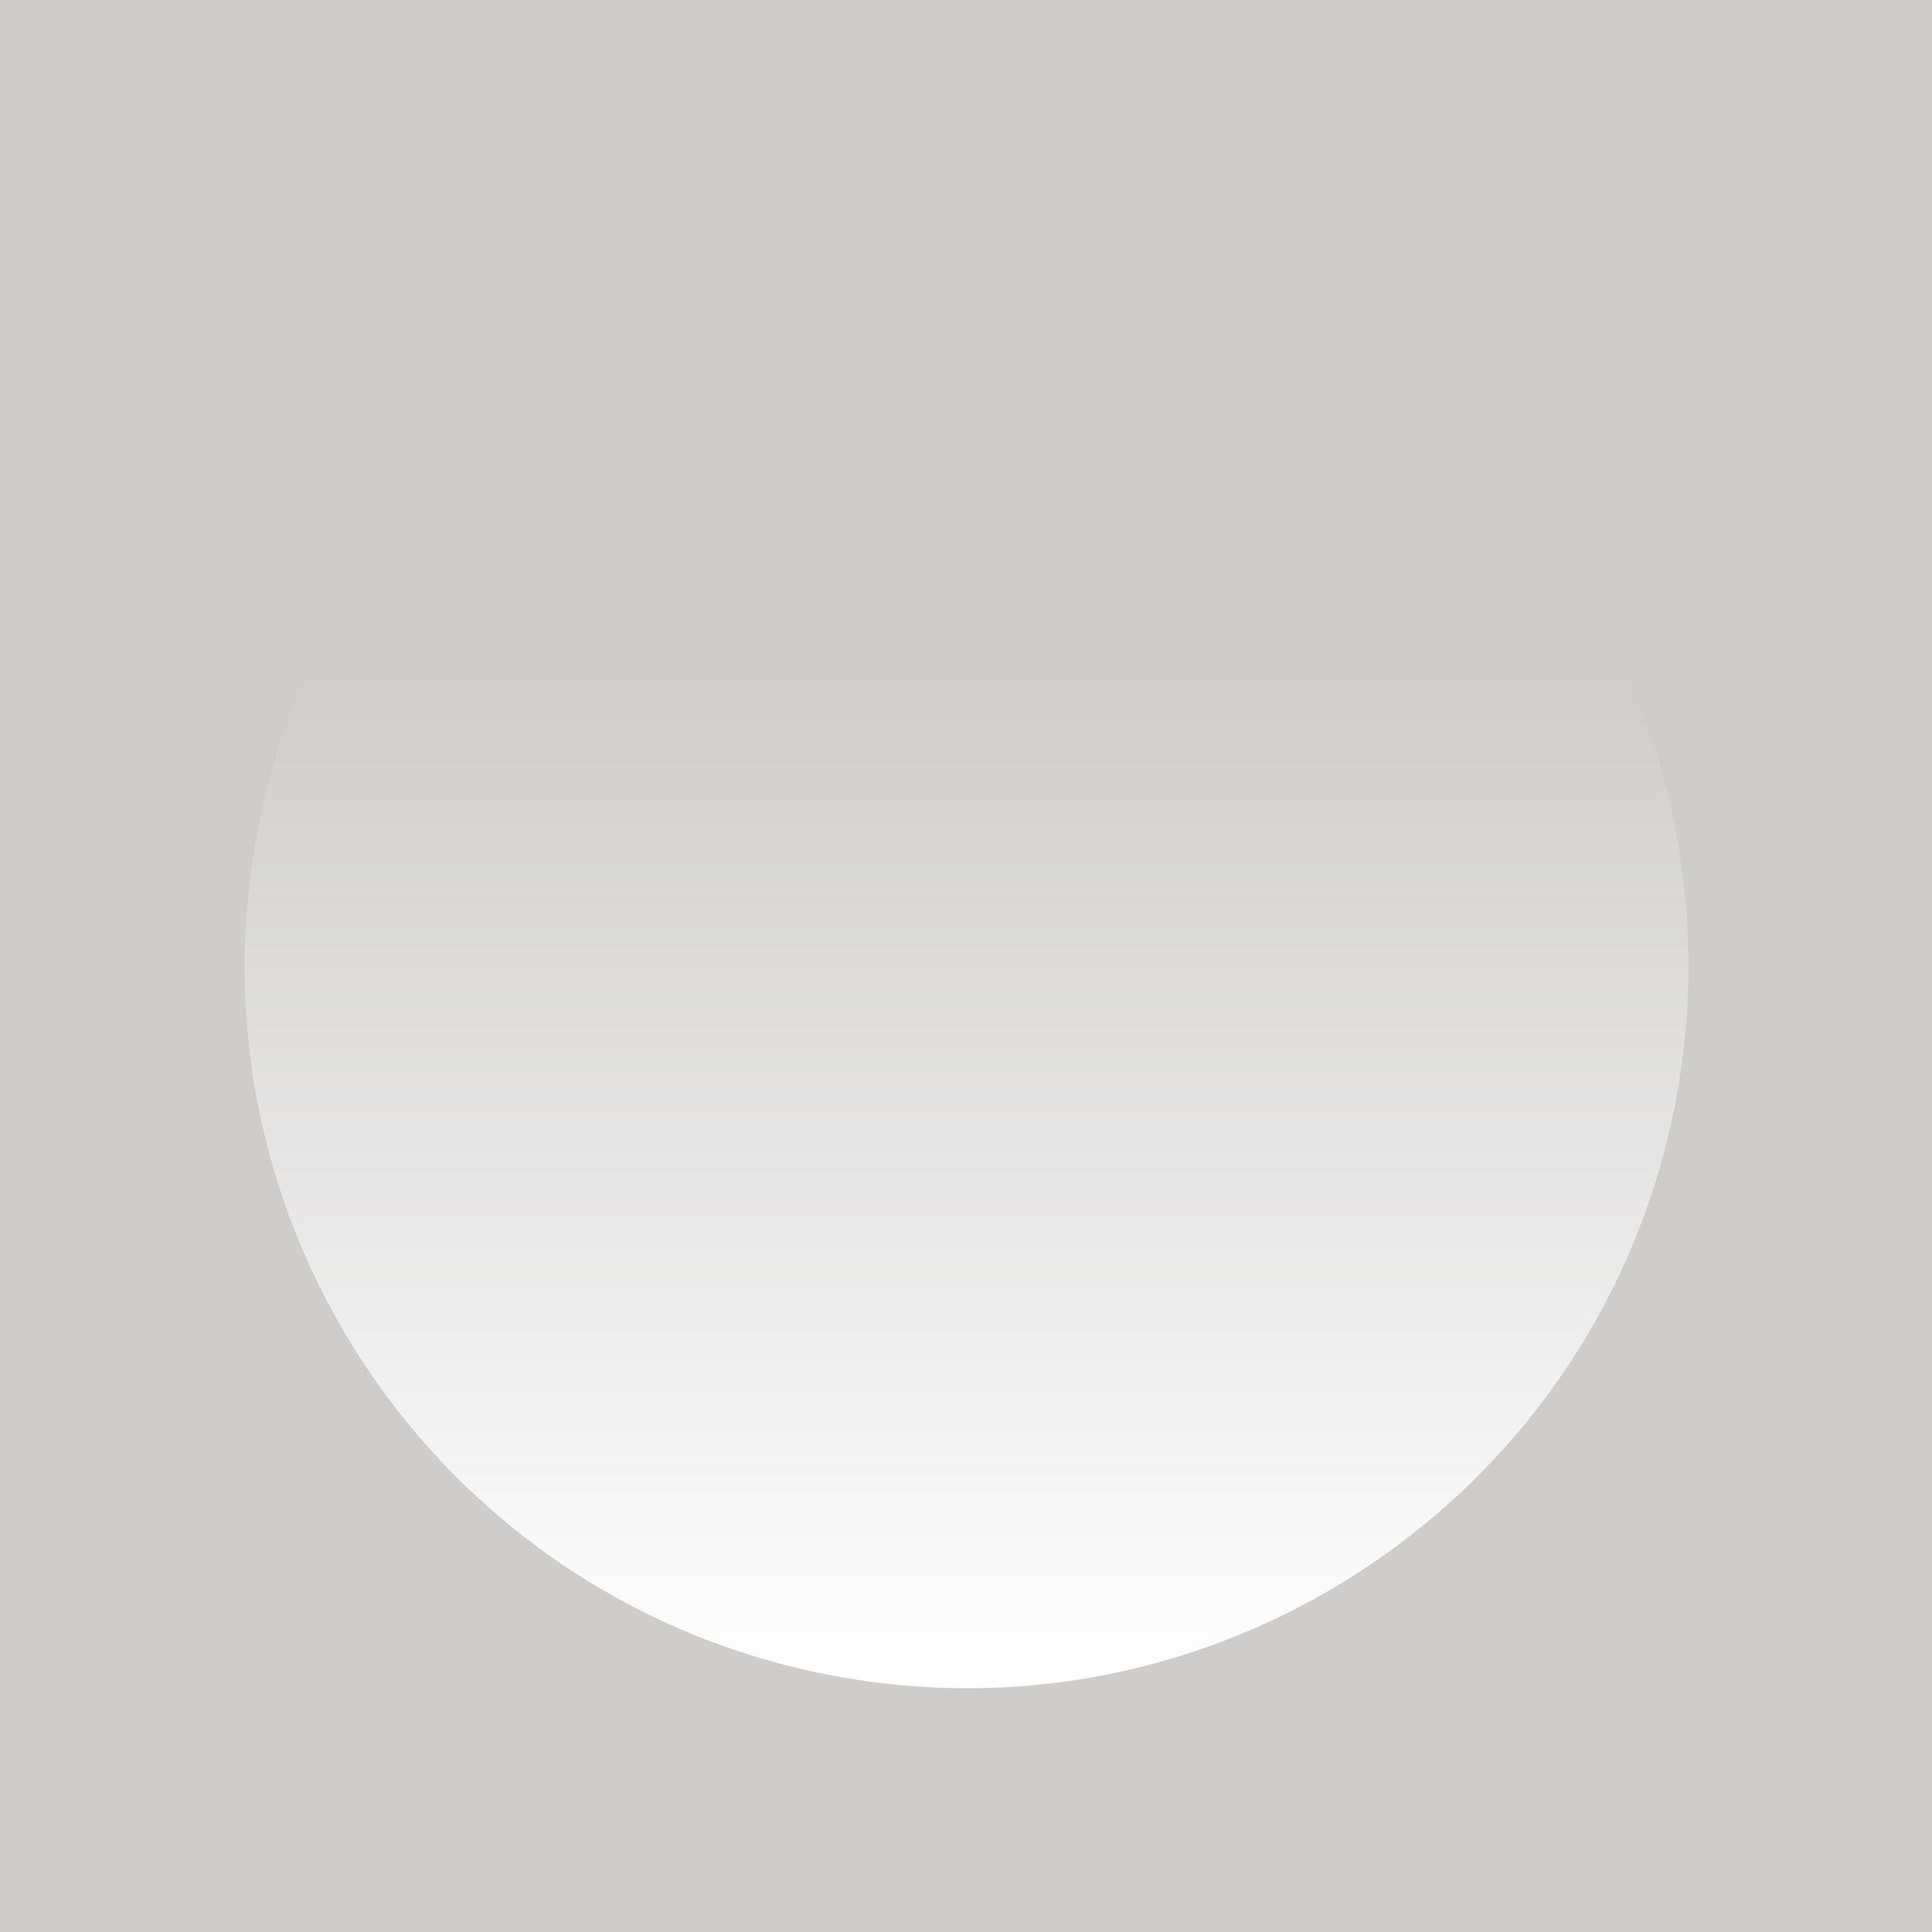 Pattern-23.jpg